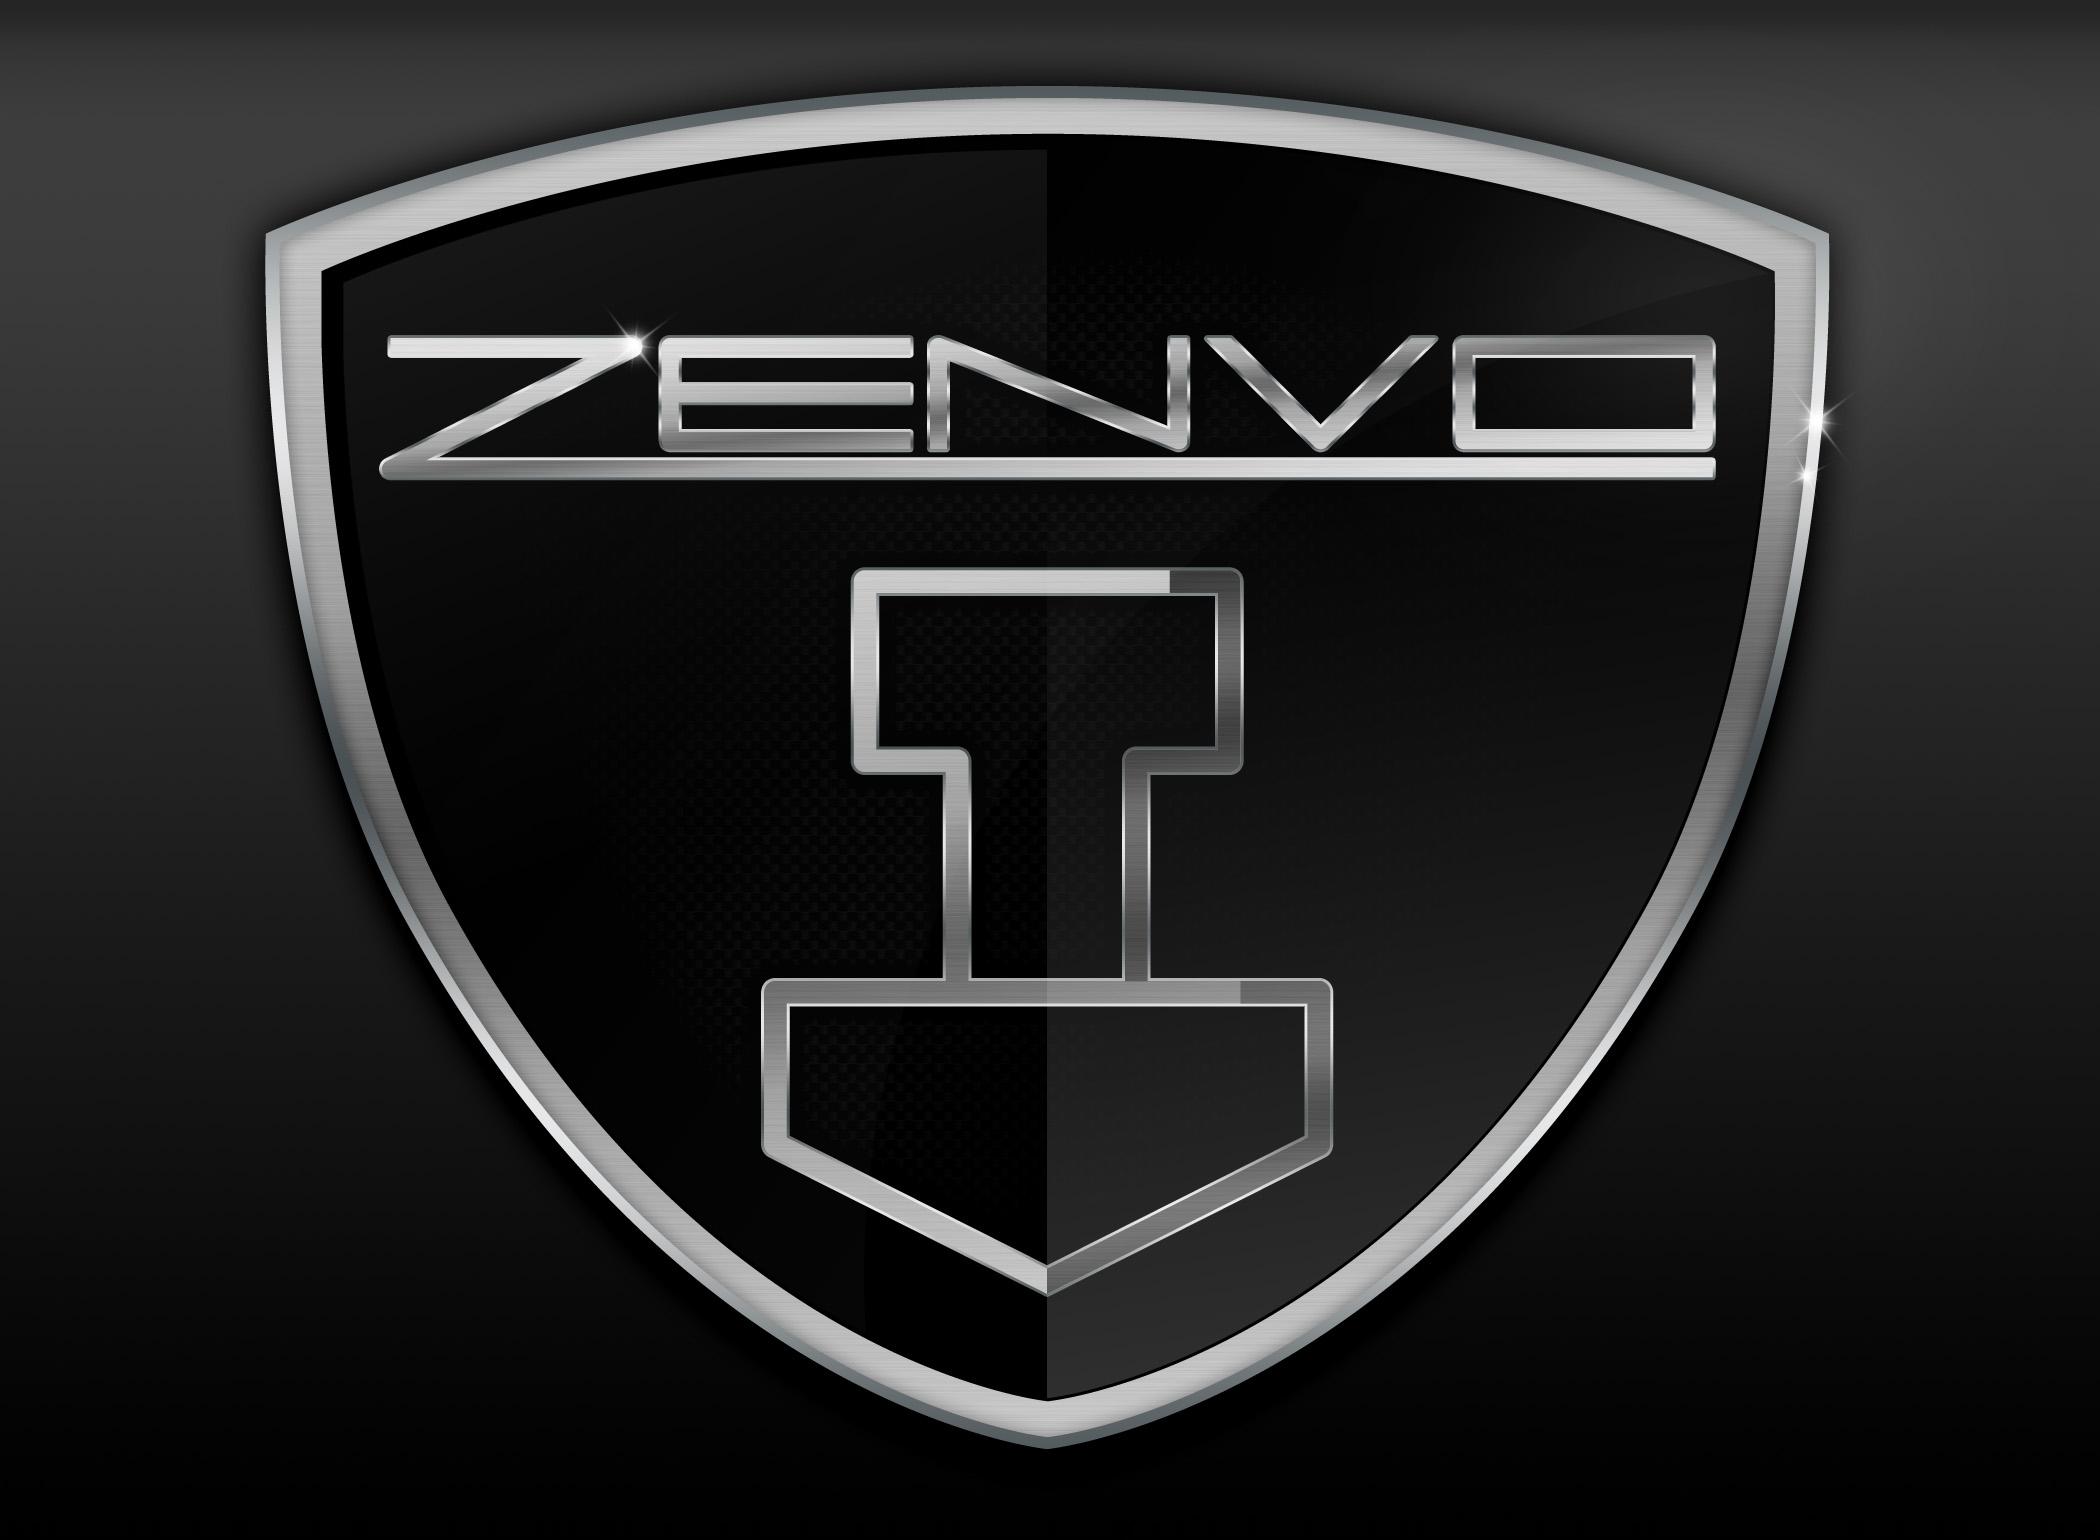 zenvo  u2013 logos download